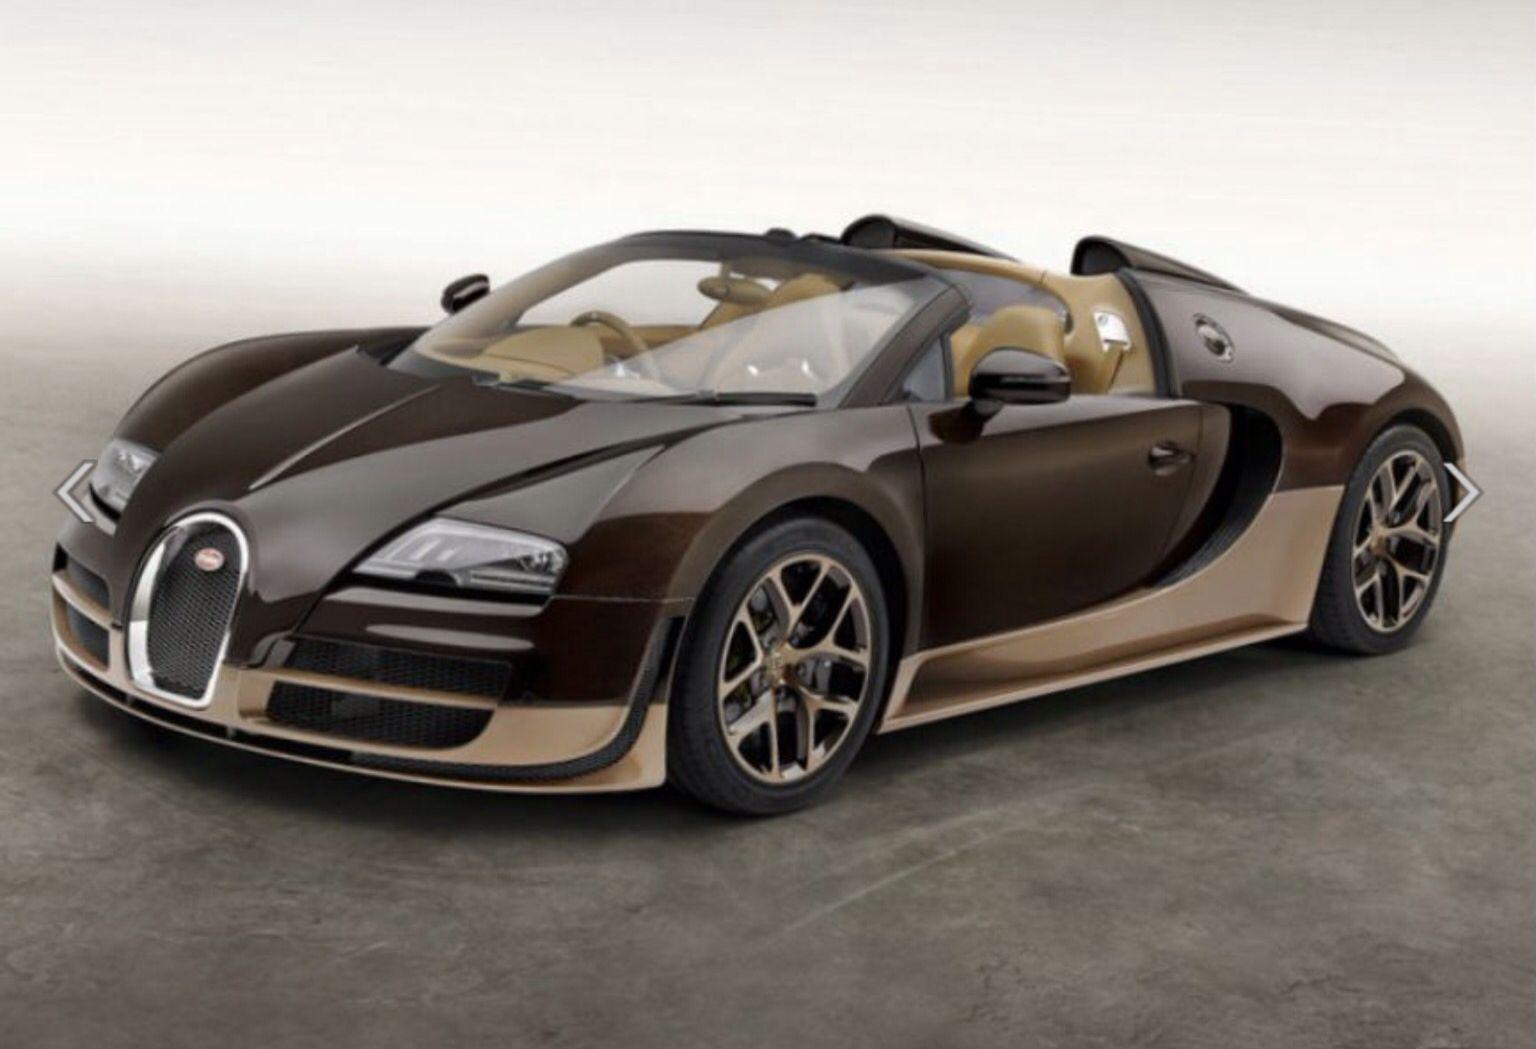 Rembrandt Bugatti Bugatti veyron, Bugatti, Bugatti